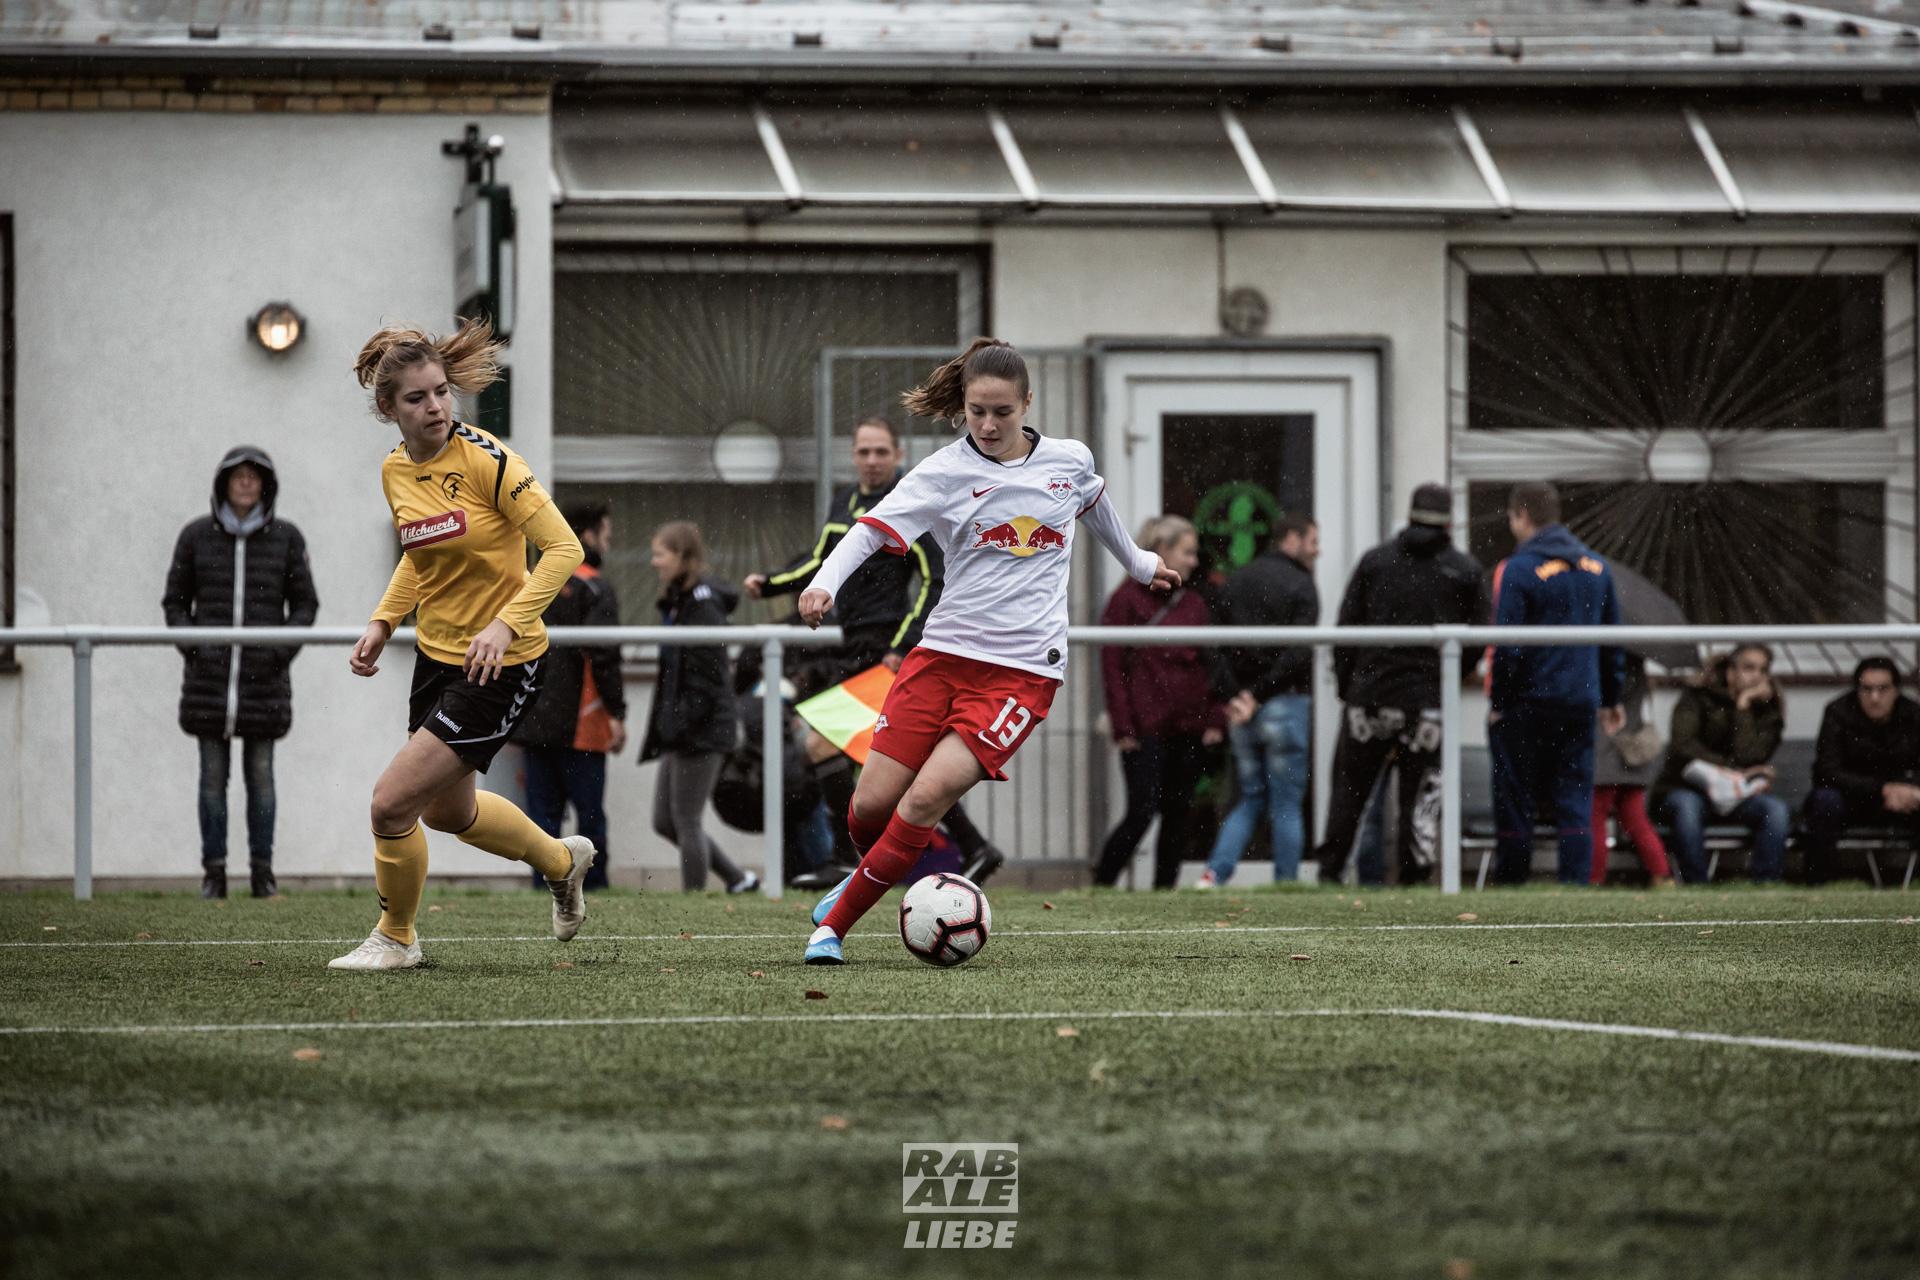 Landesliga Frauen: RB Leipzig II -vs- 1. FFC Fortuna Dresden